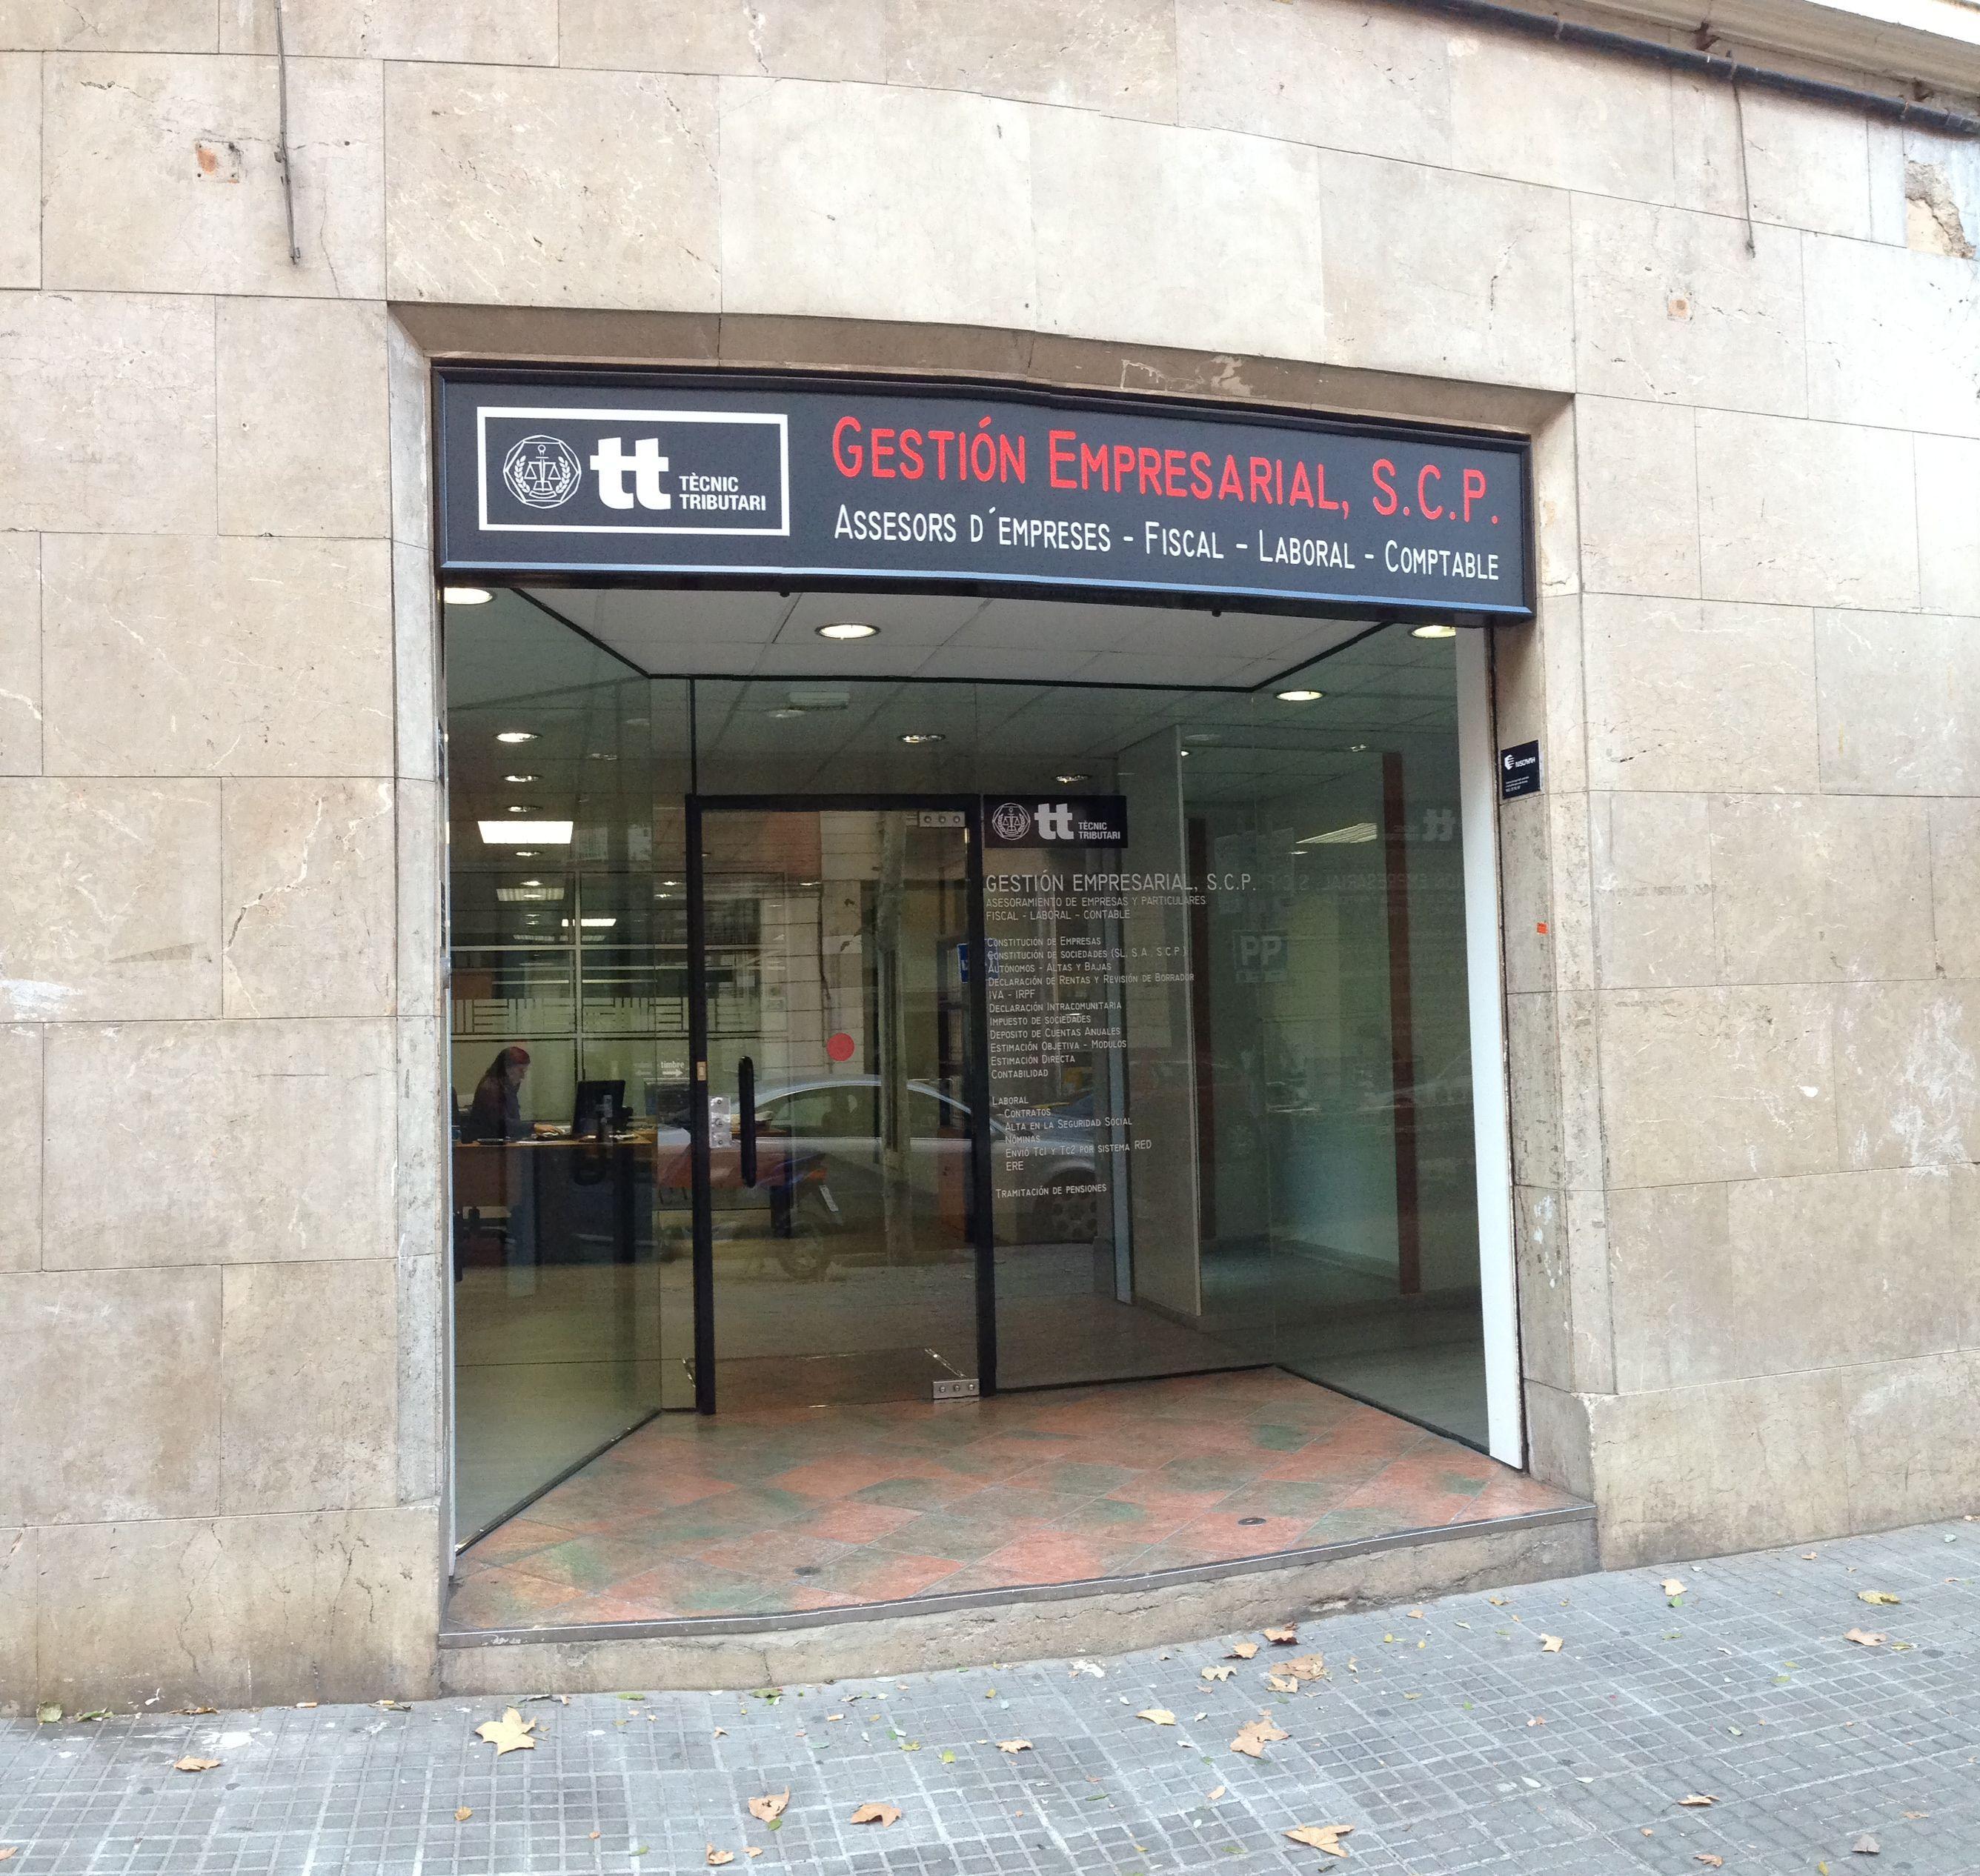 Gestor a empresas en barcelona scp gesti n empresarial - Empresas constructoras en barcelona ...